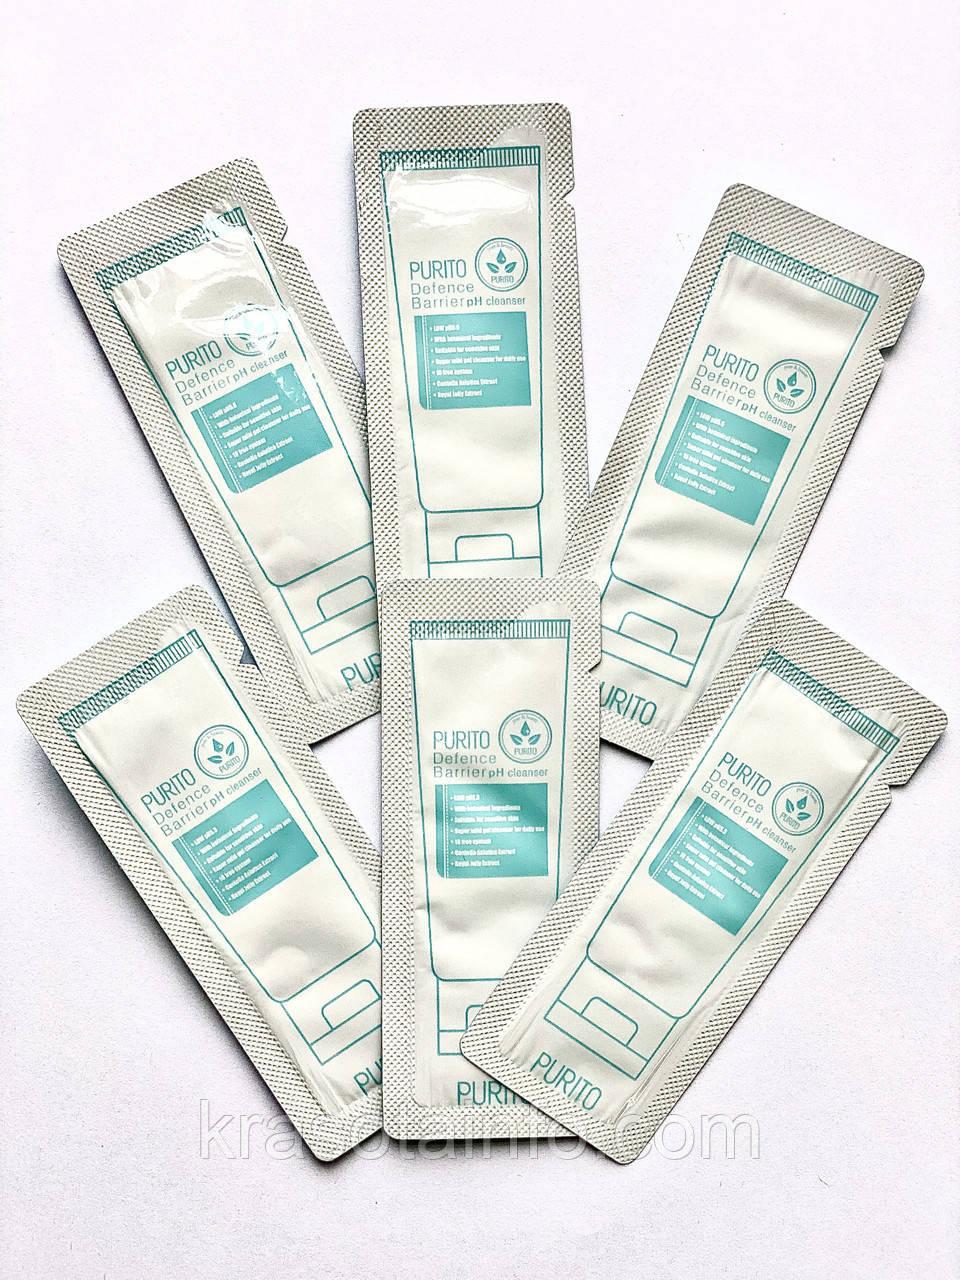 PURITO Defence Barrier pH cleanser гель для умывания (пробник)